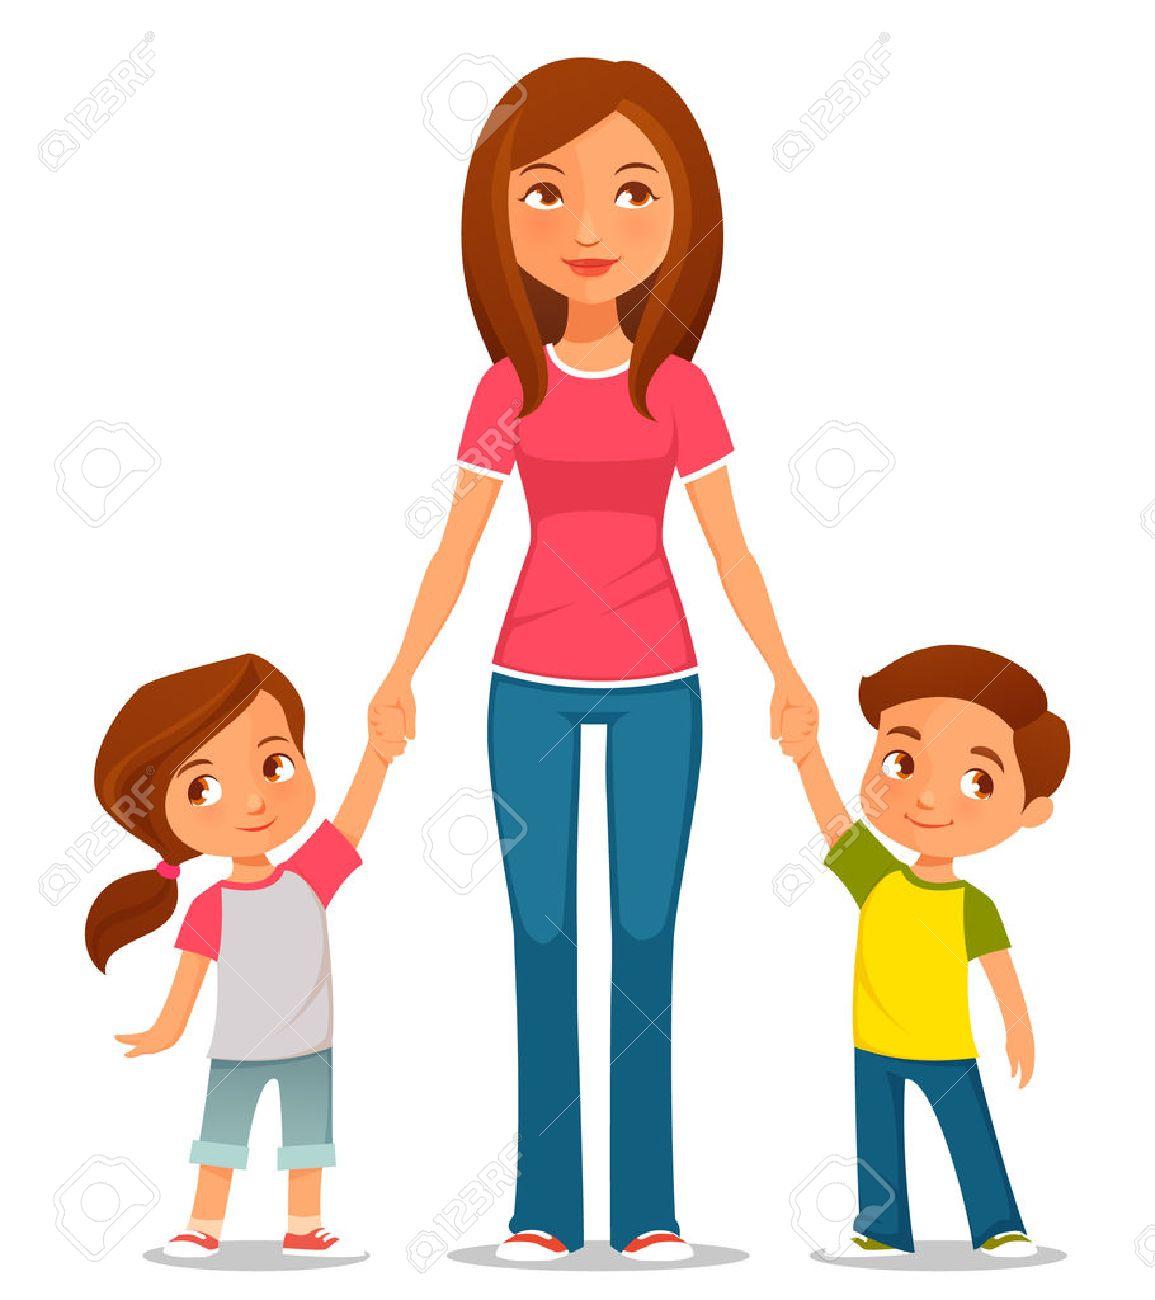 Single parent family clipart 4 » Clipart Station.